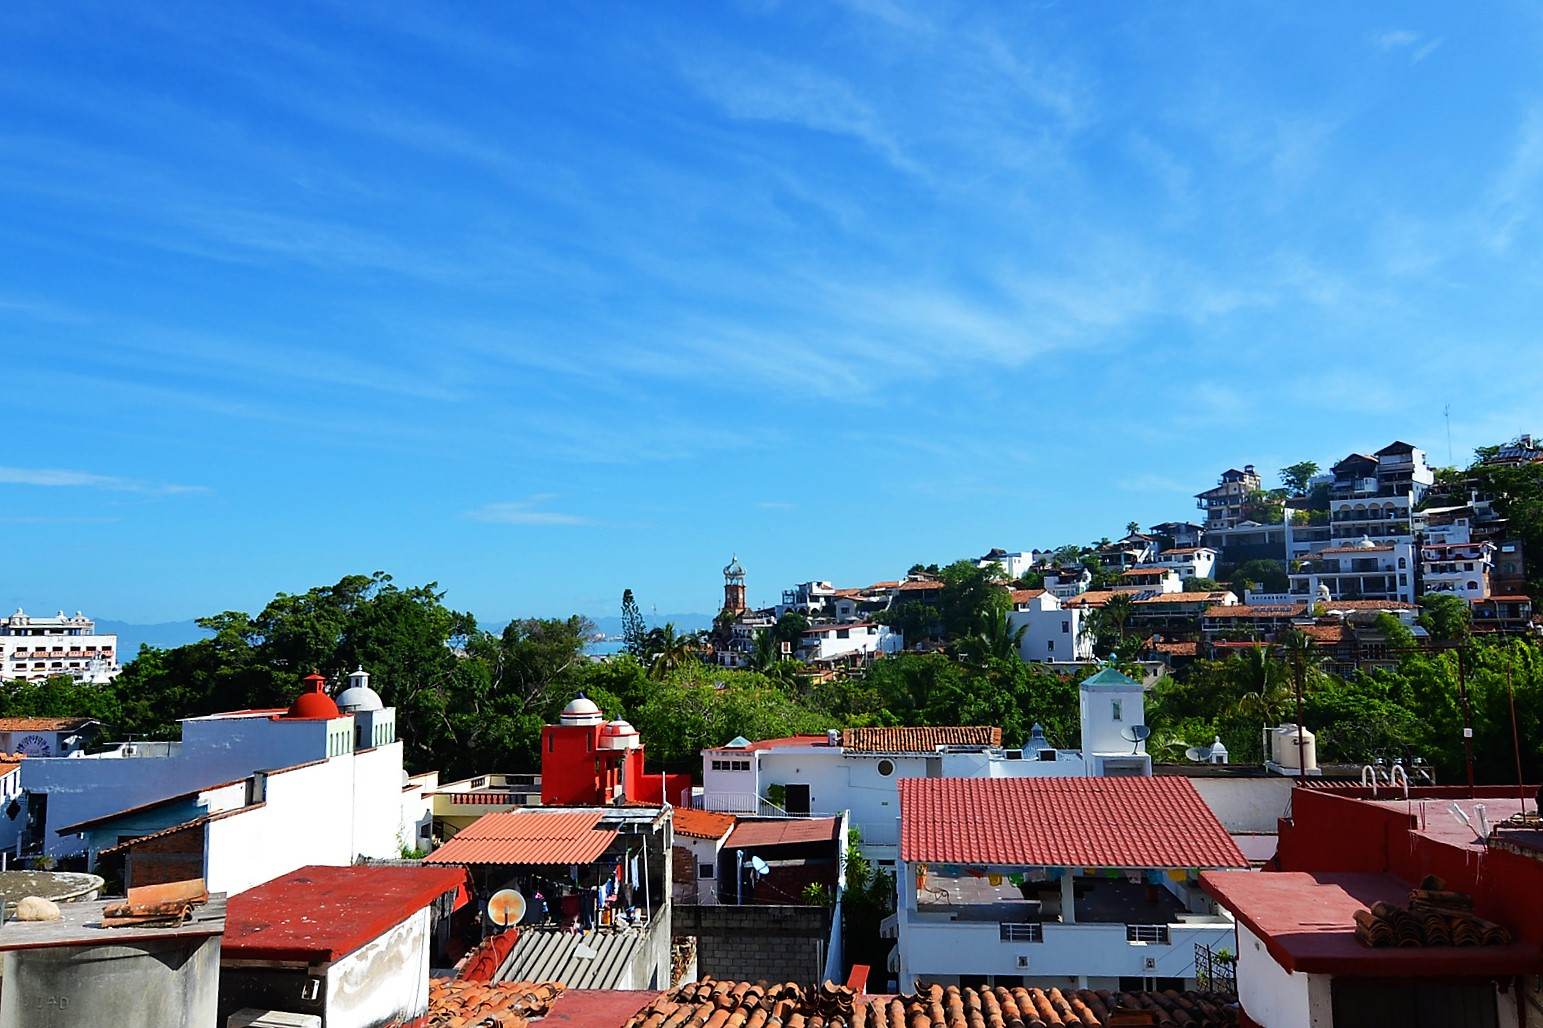 Condo Avida Super Studio 4 - Puerto Vallarta Furnished Condo Romantic Zone (28)